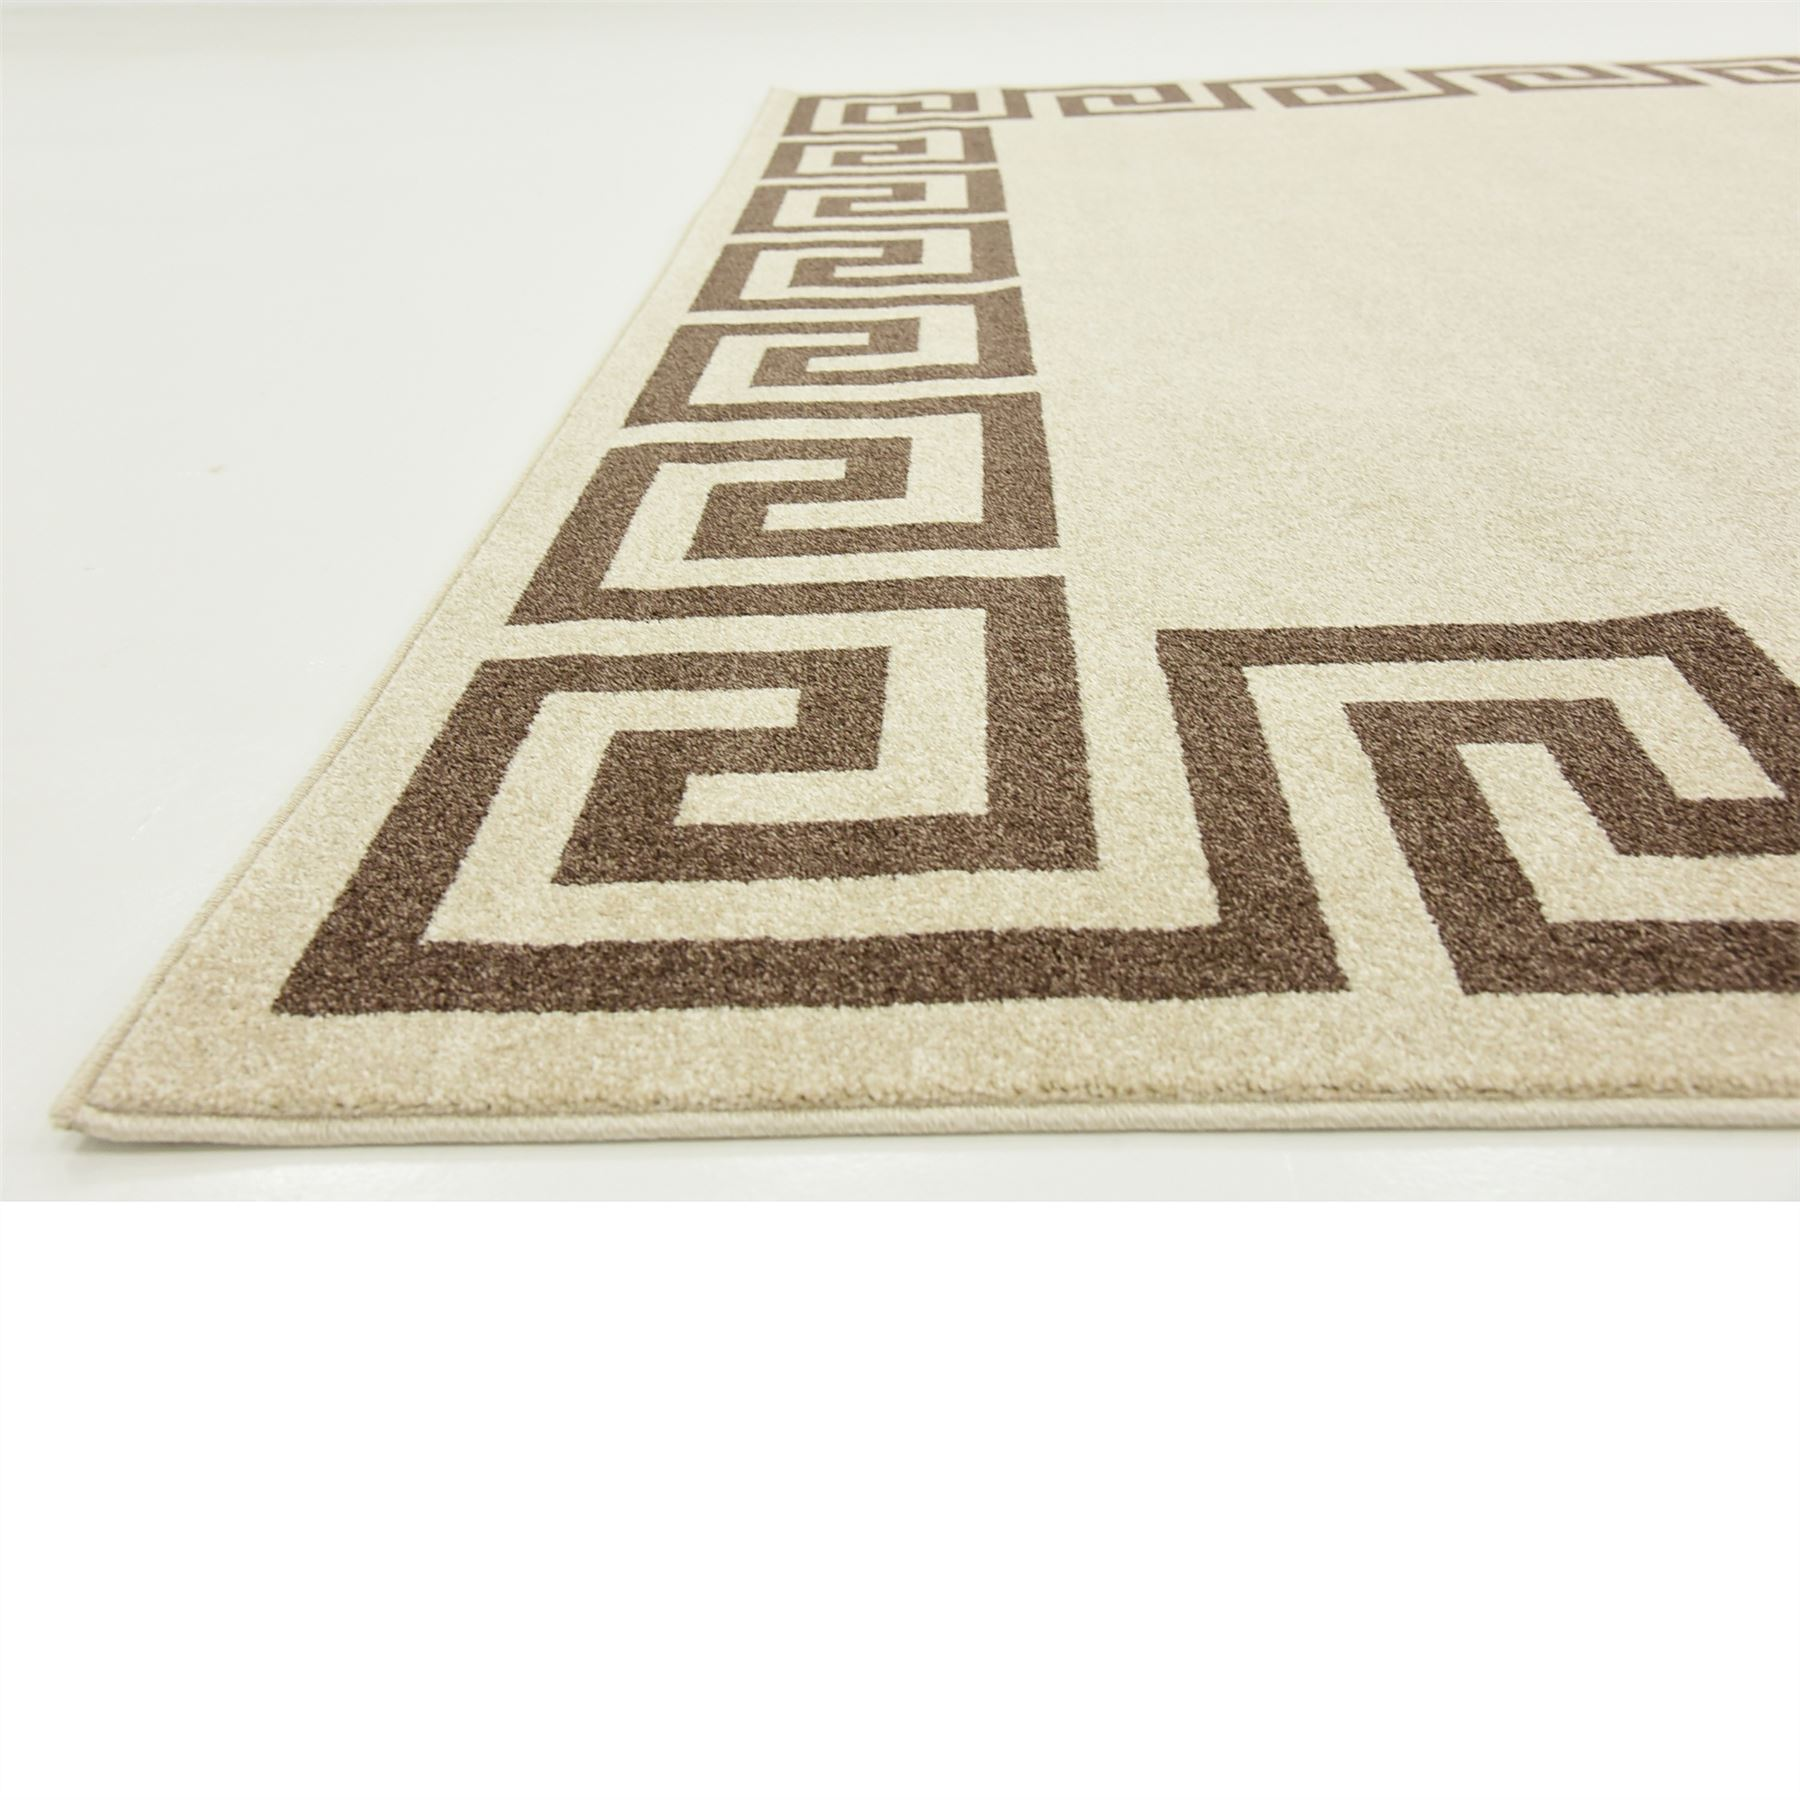 Modern greek design border area rug contemporary large for Modern design area rugs